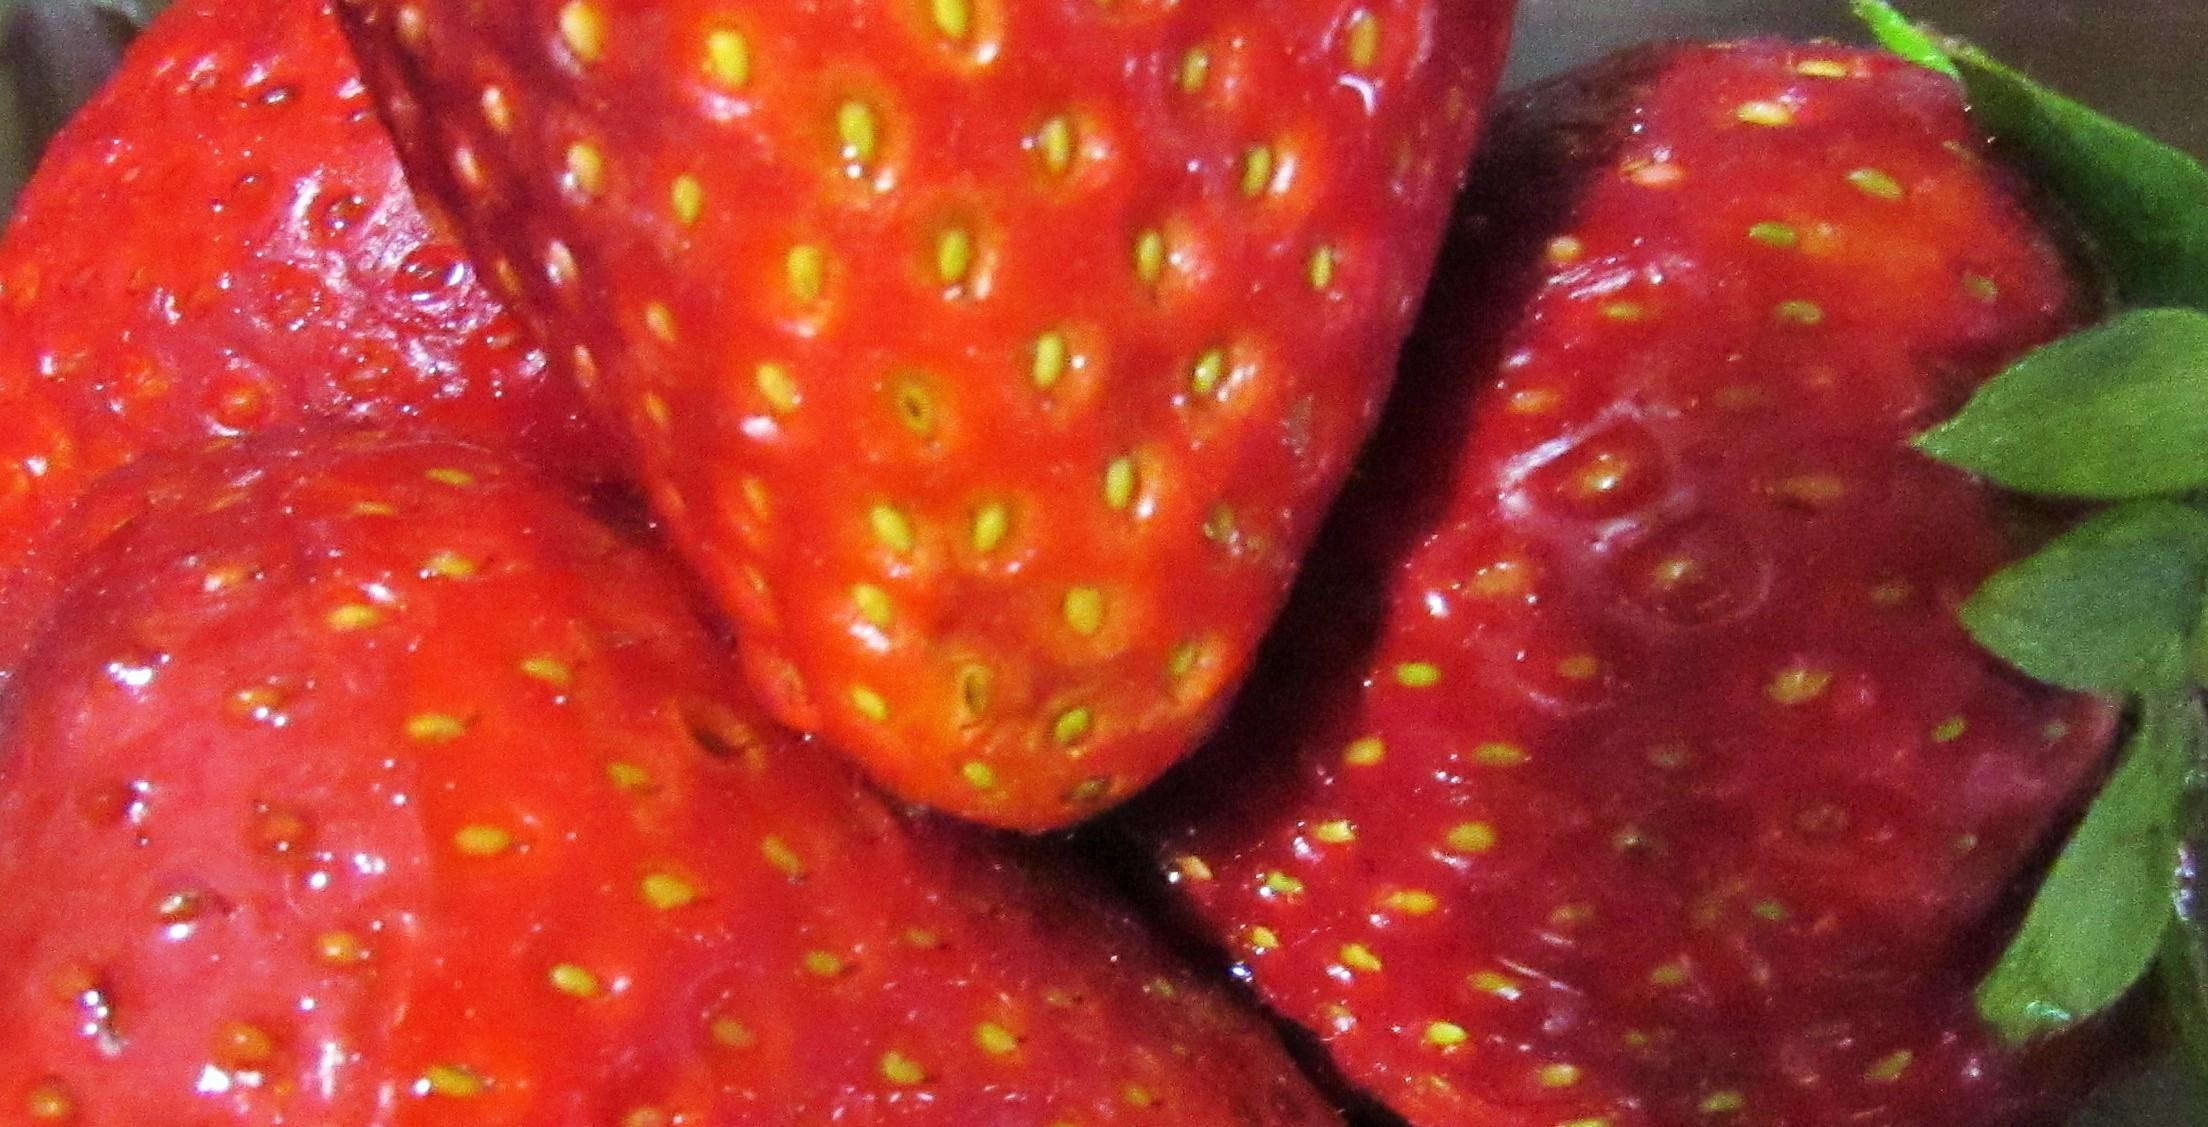 strawberry moon - HD2208×1127